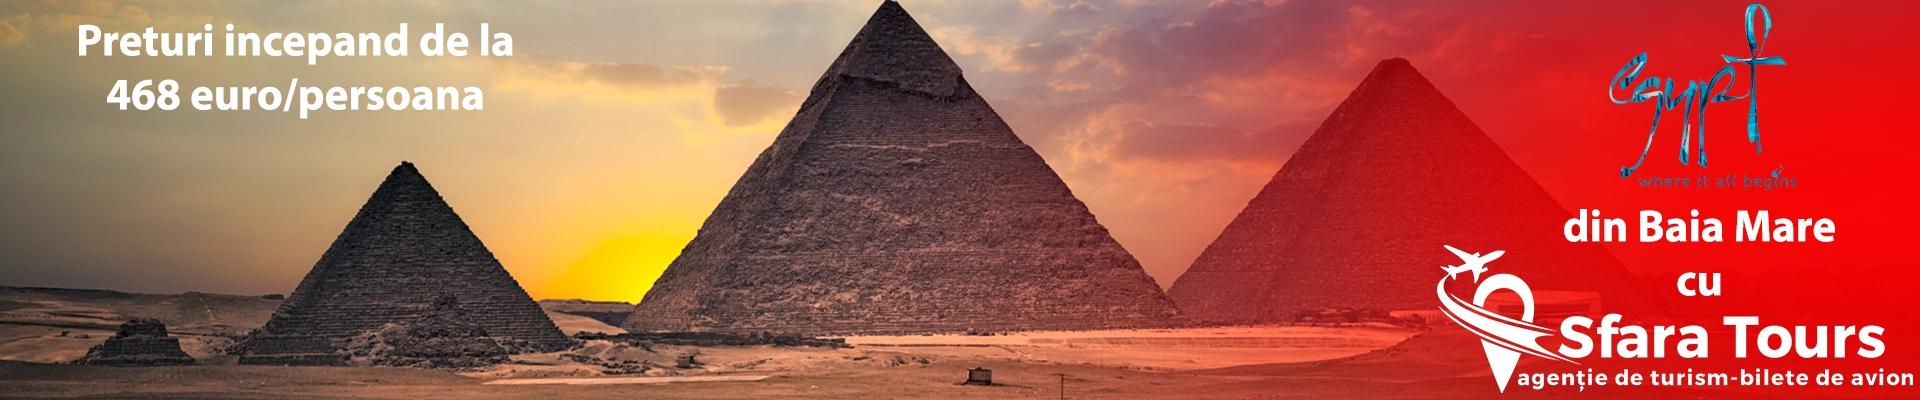 Egypt din Baia Mare